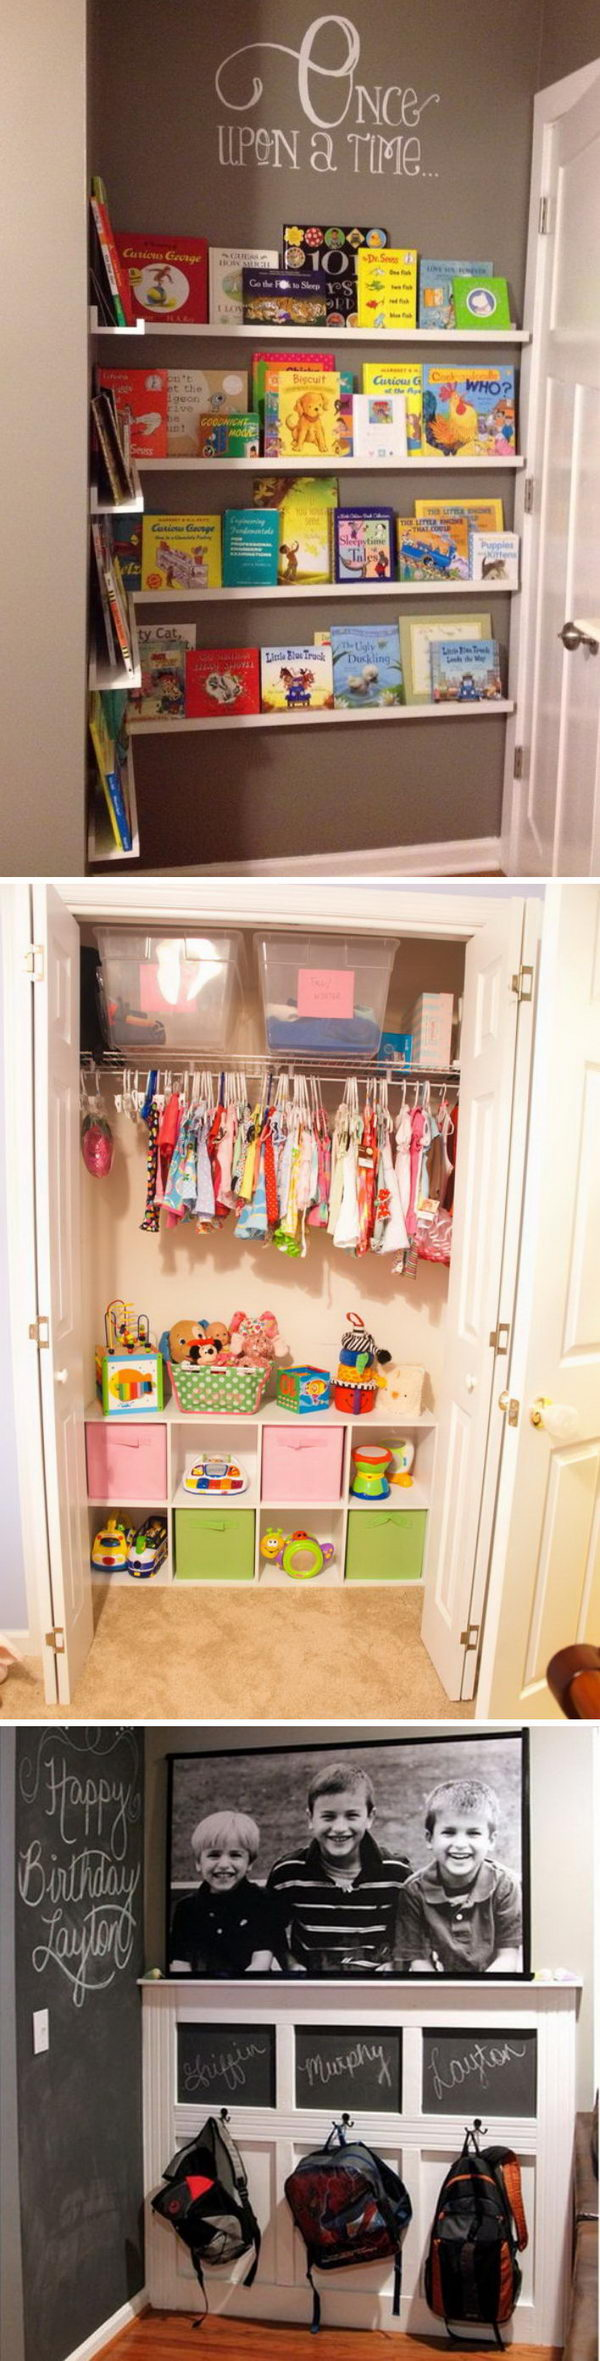 Creative Storage Ideas to Organize Kids' Room.